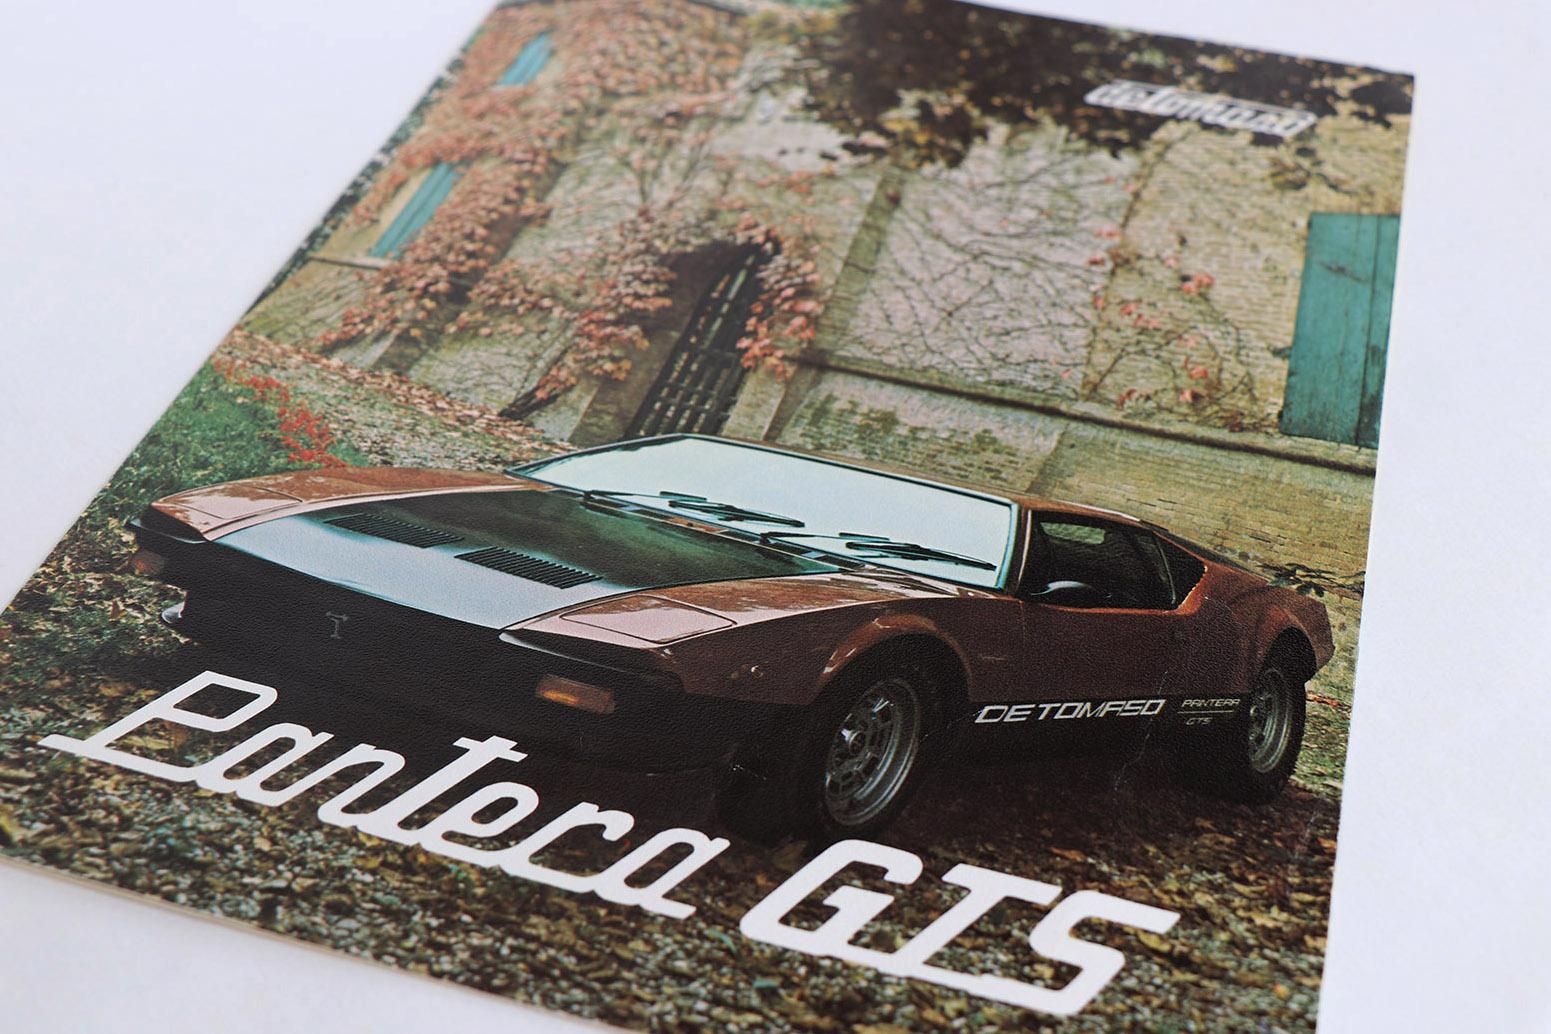 De Tomaso Pantera GTS brochure front 2 copy web.jpg